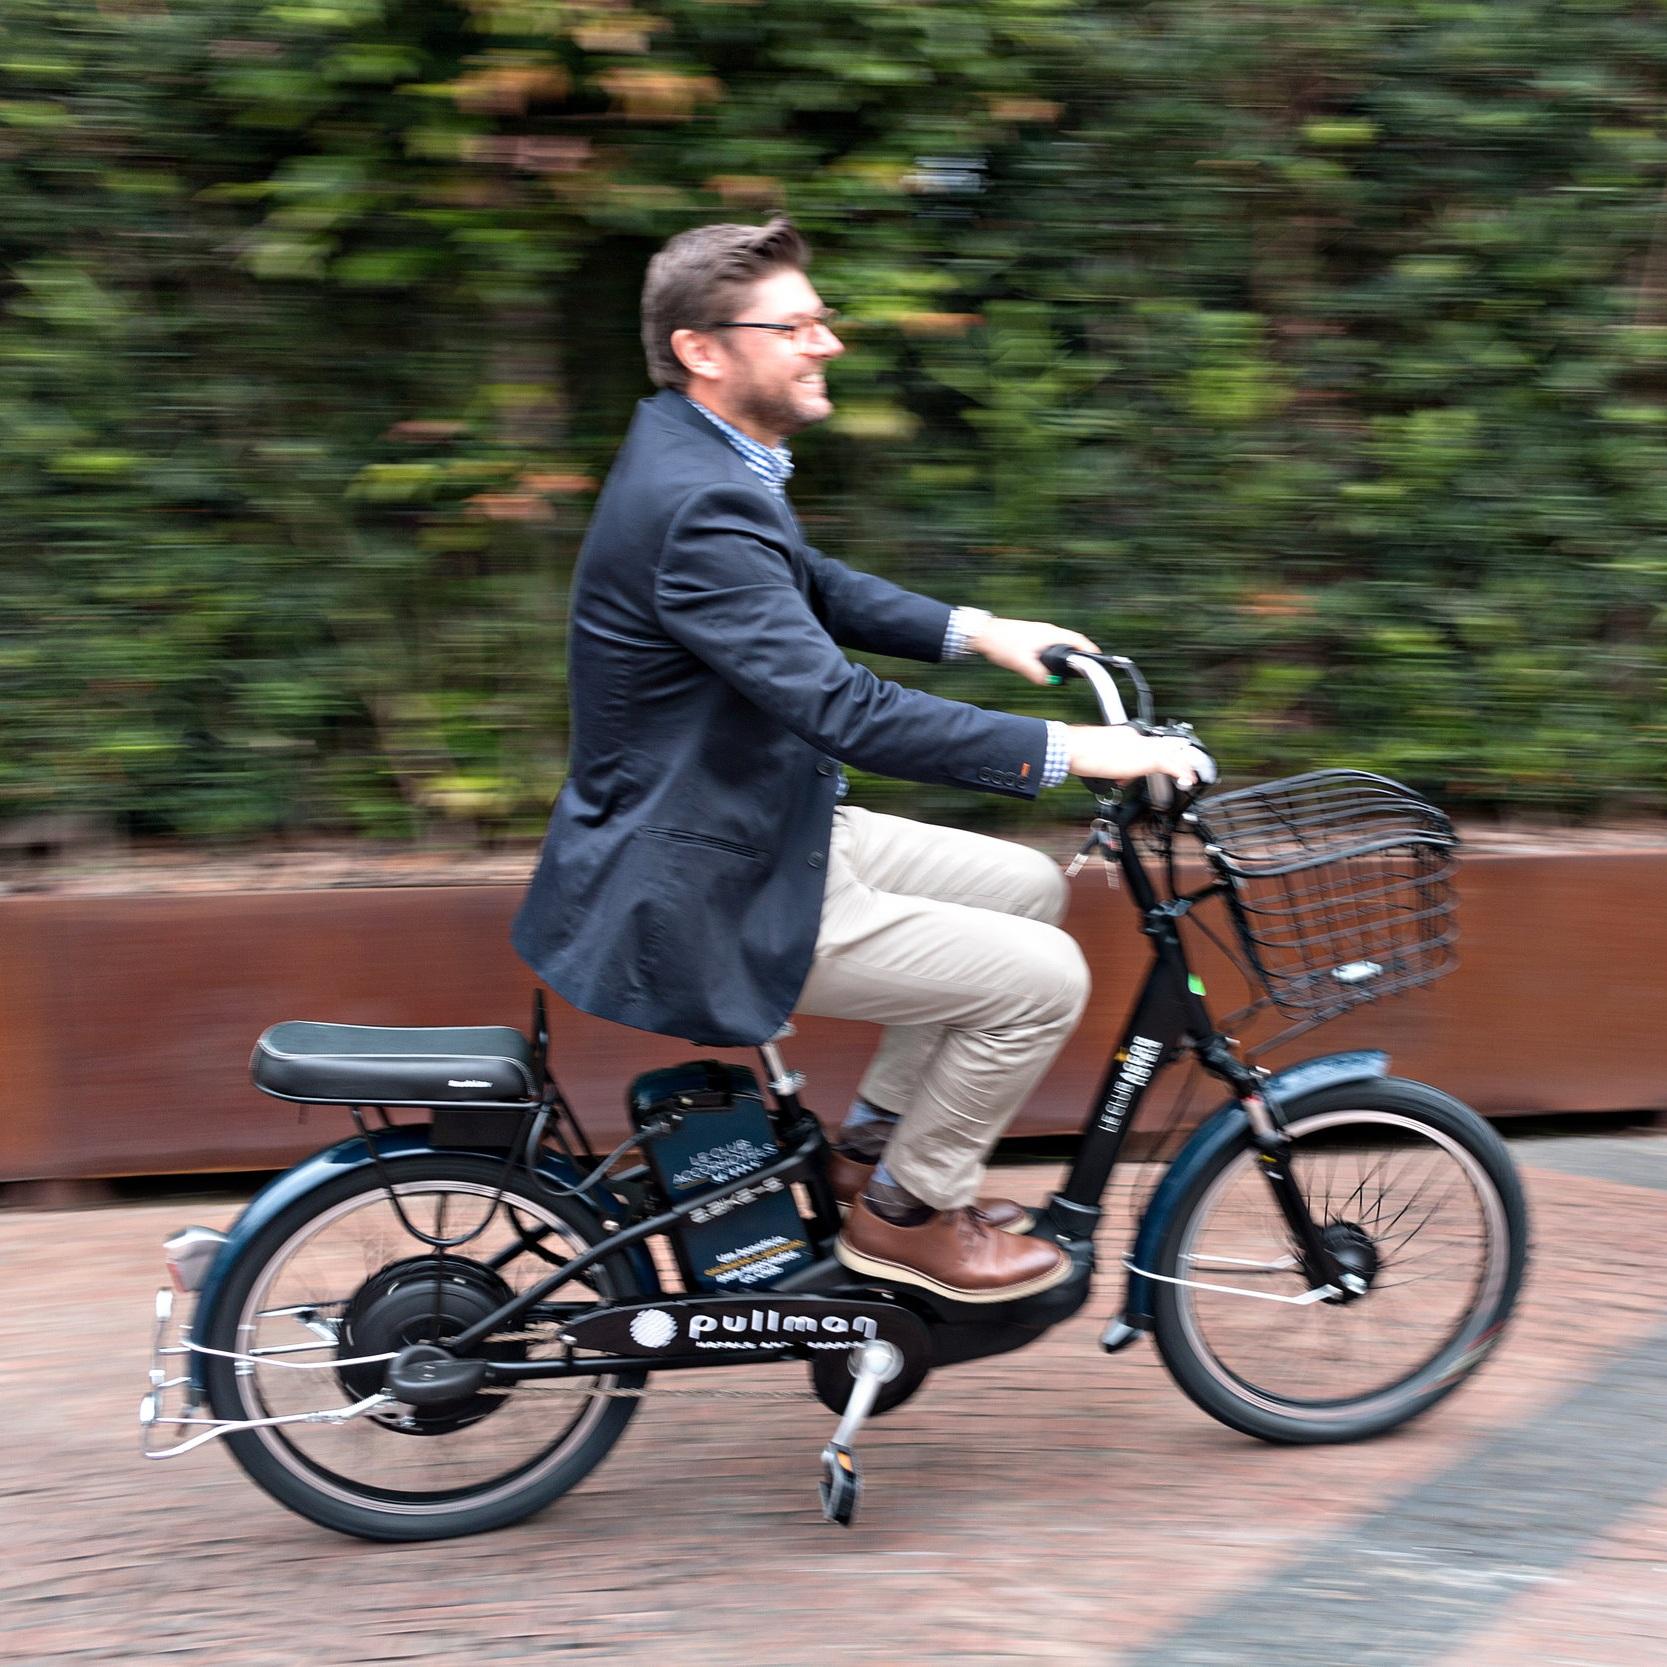 Energy Bike - Bike Elétrica como experiência diferenciada no restaurante TasteIt Food & Lounge